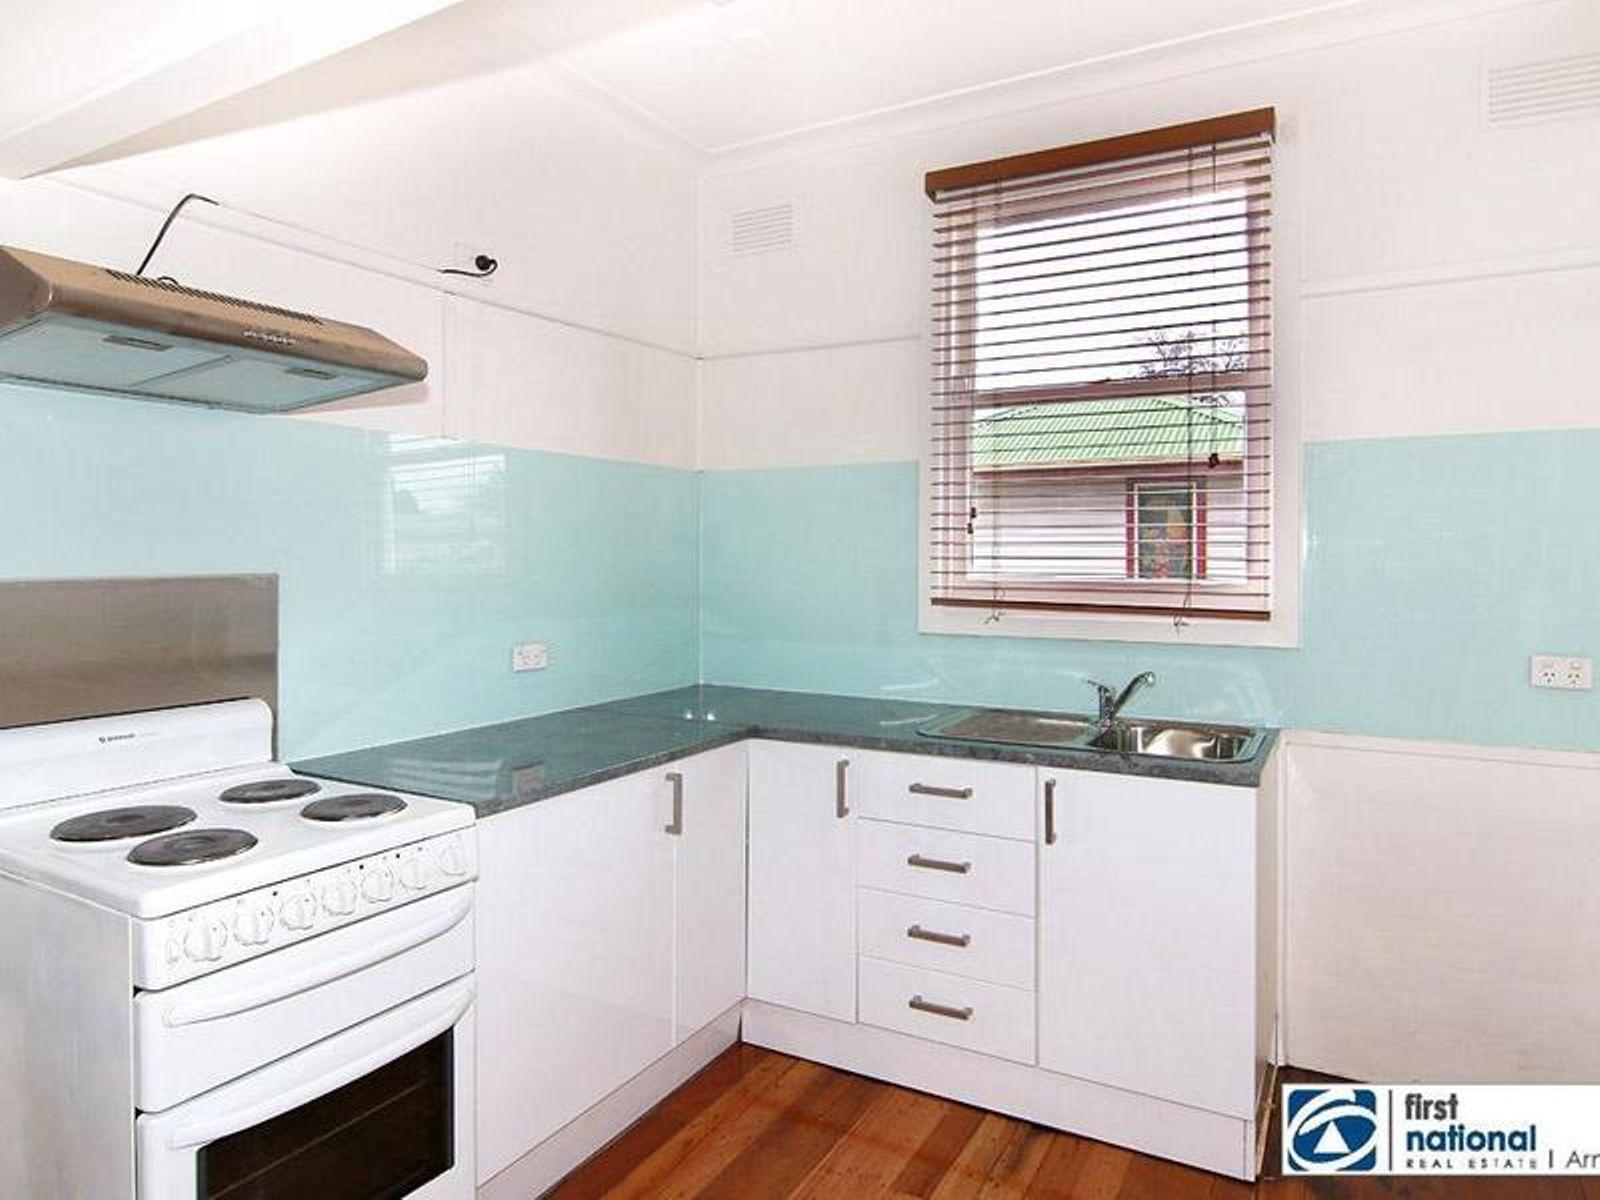 9 Elizabeth St, Armidale NSW 2350, Australia , House for Sale - FN ...